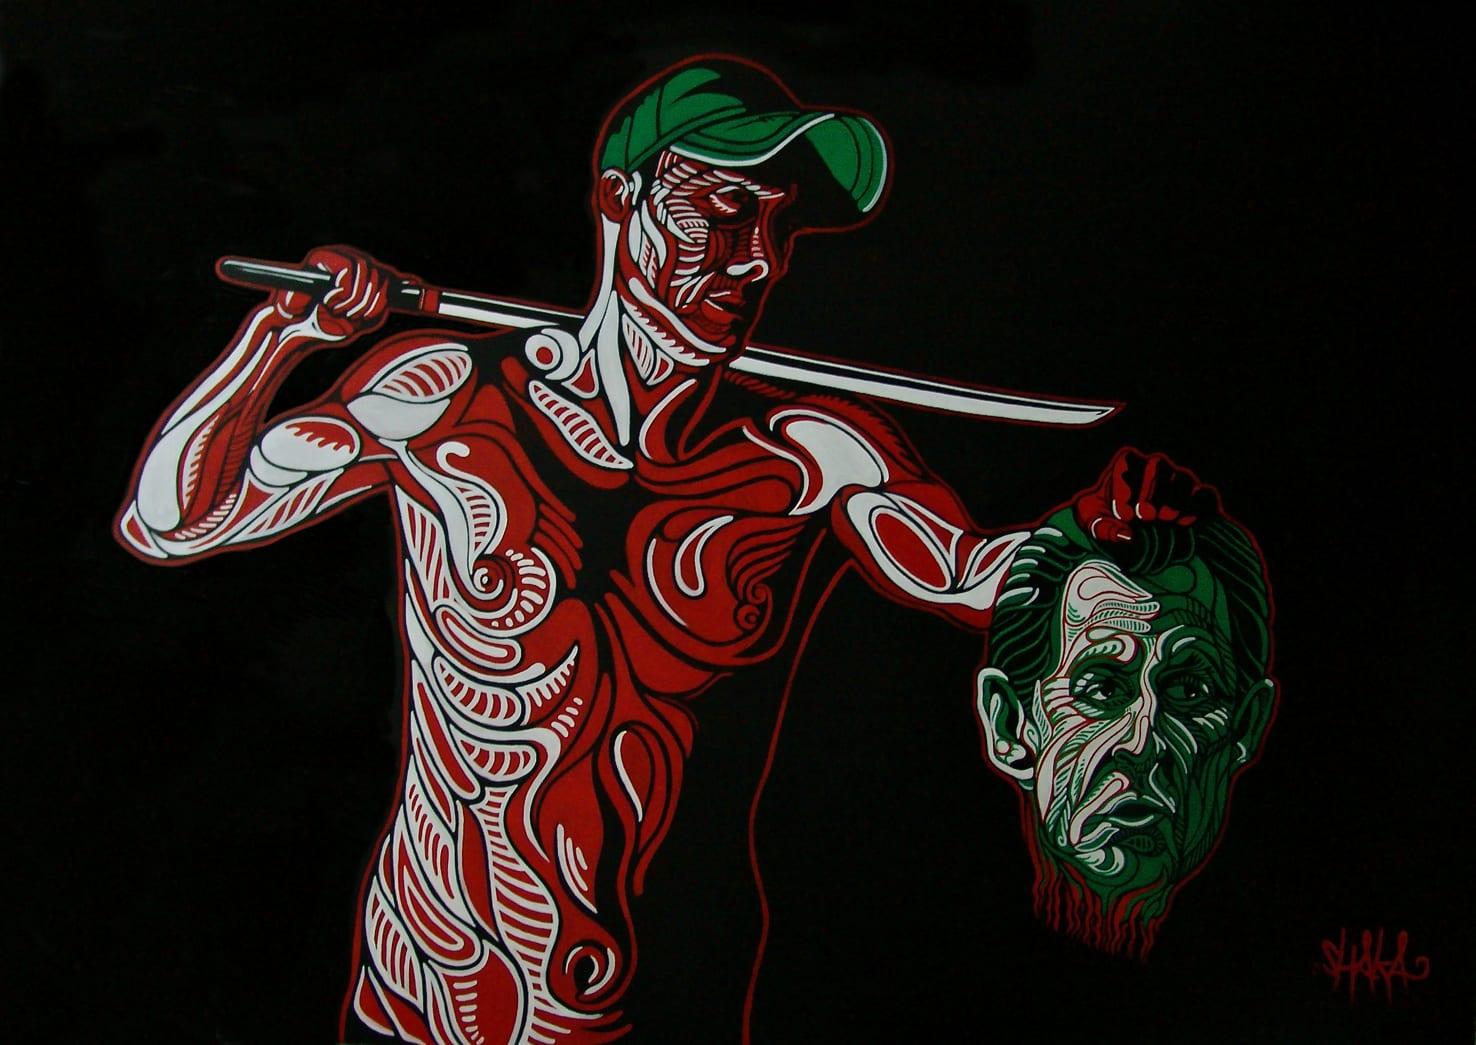 Artwork By Shaka in Évry